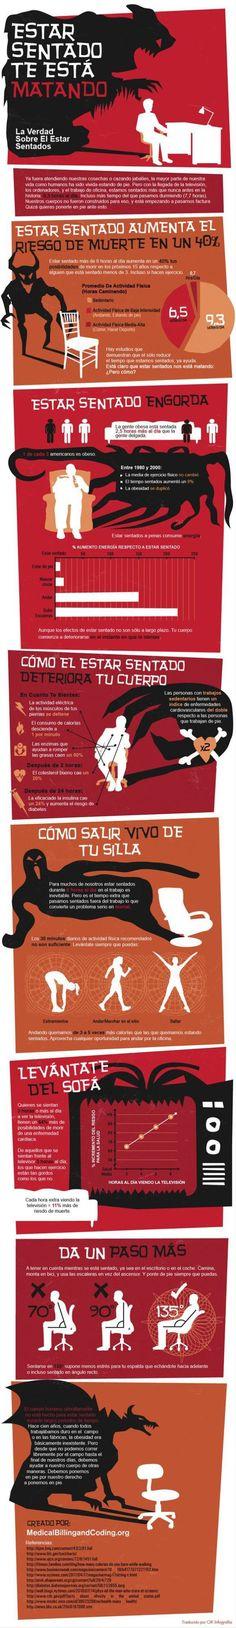 PasasMuchoTiempoSentado6CosasDebesSaber-Infografia-BlogGesvin